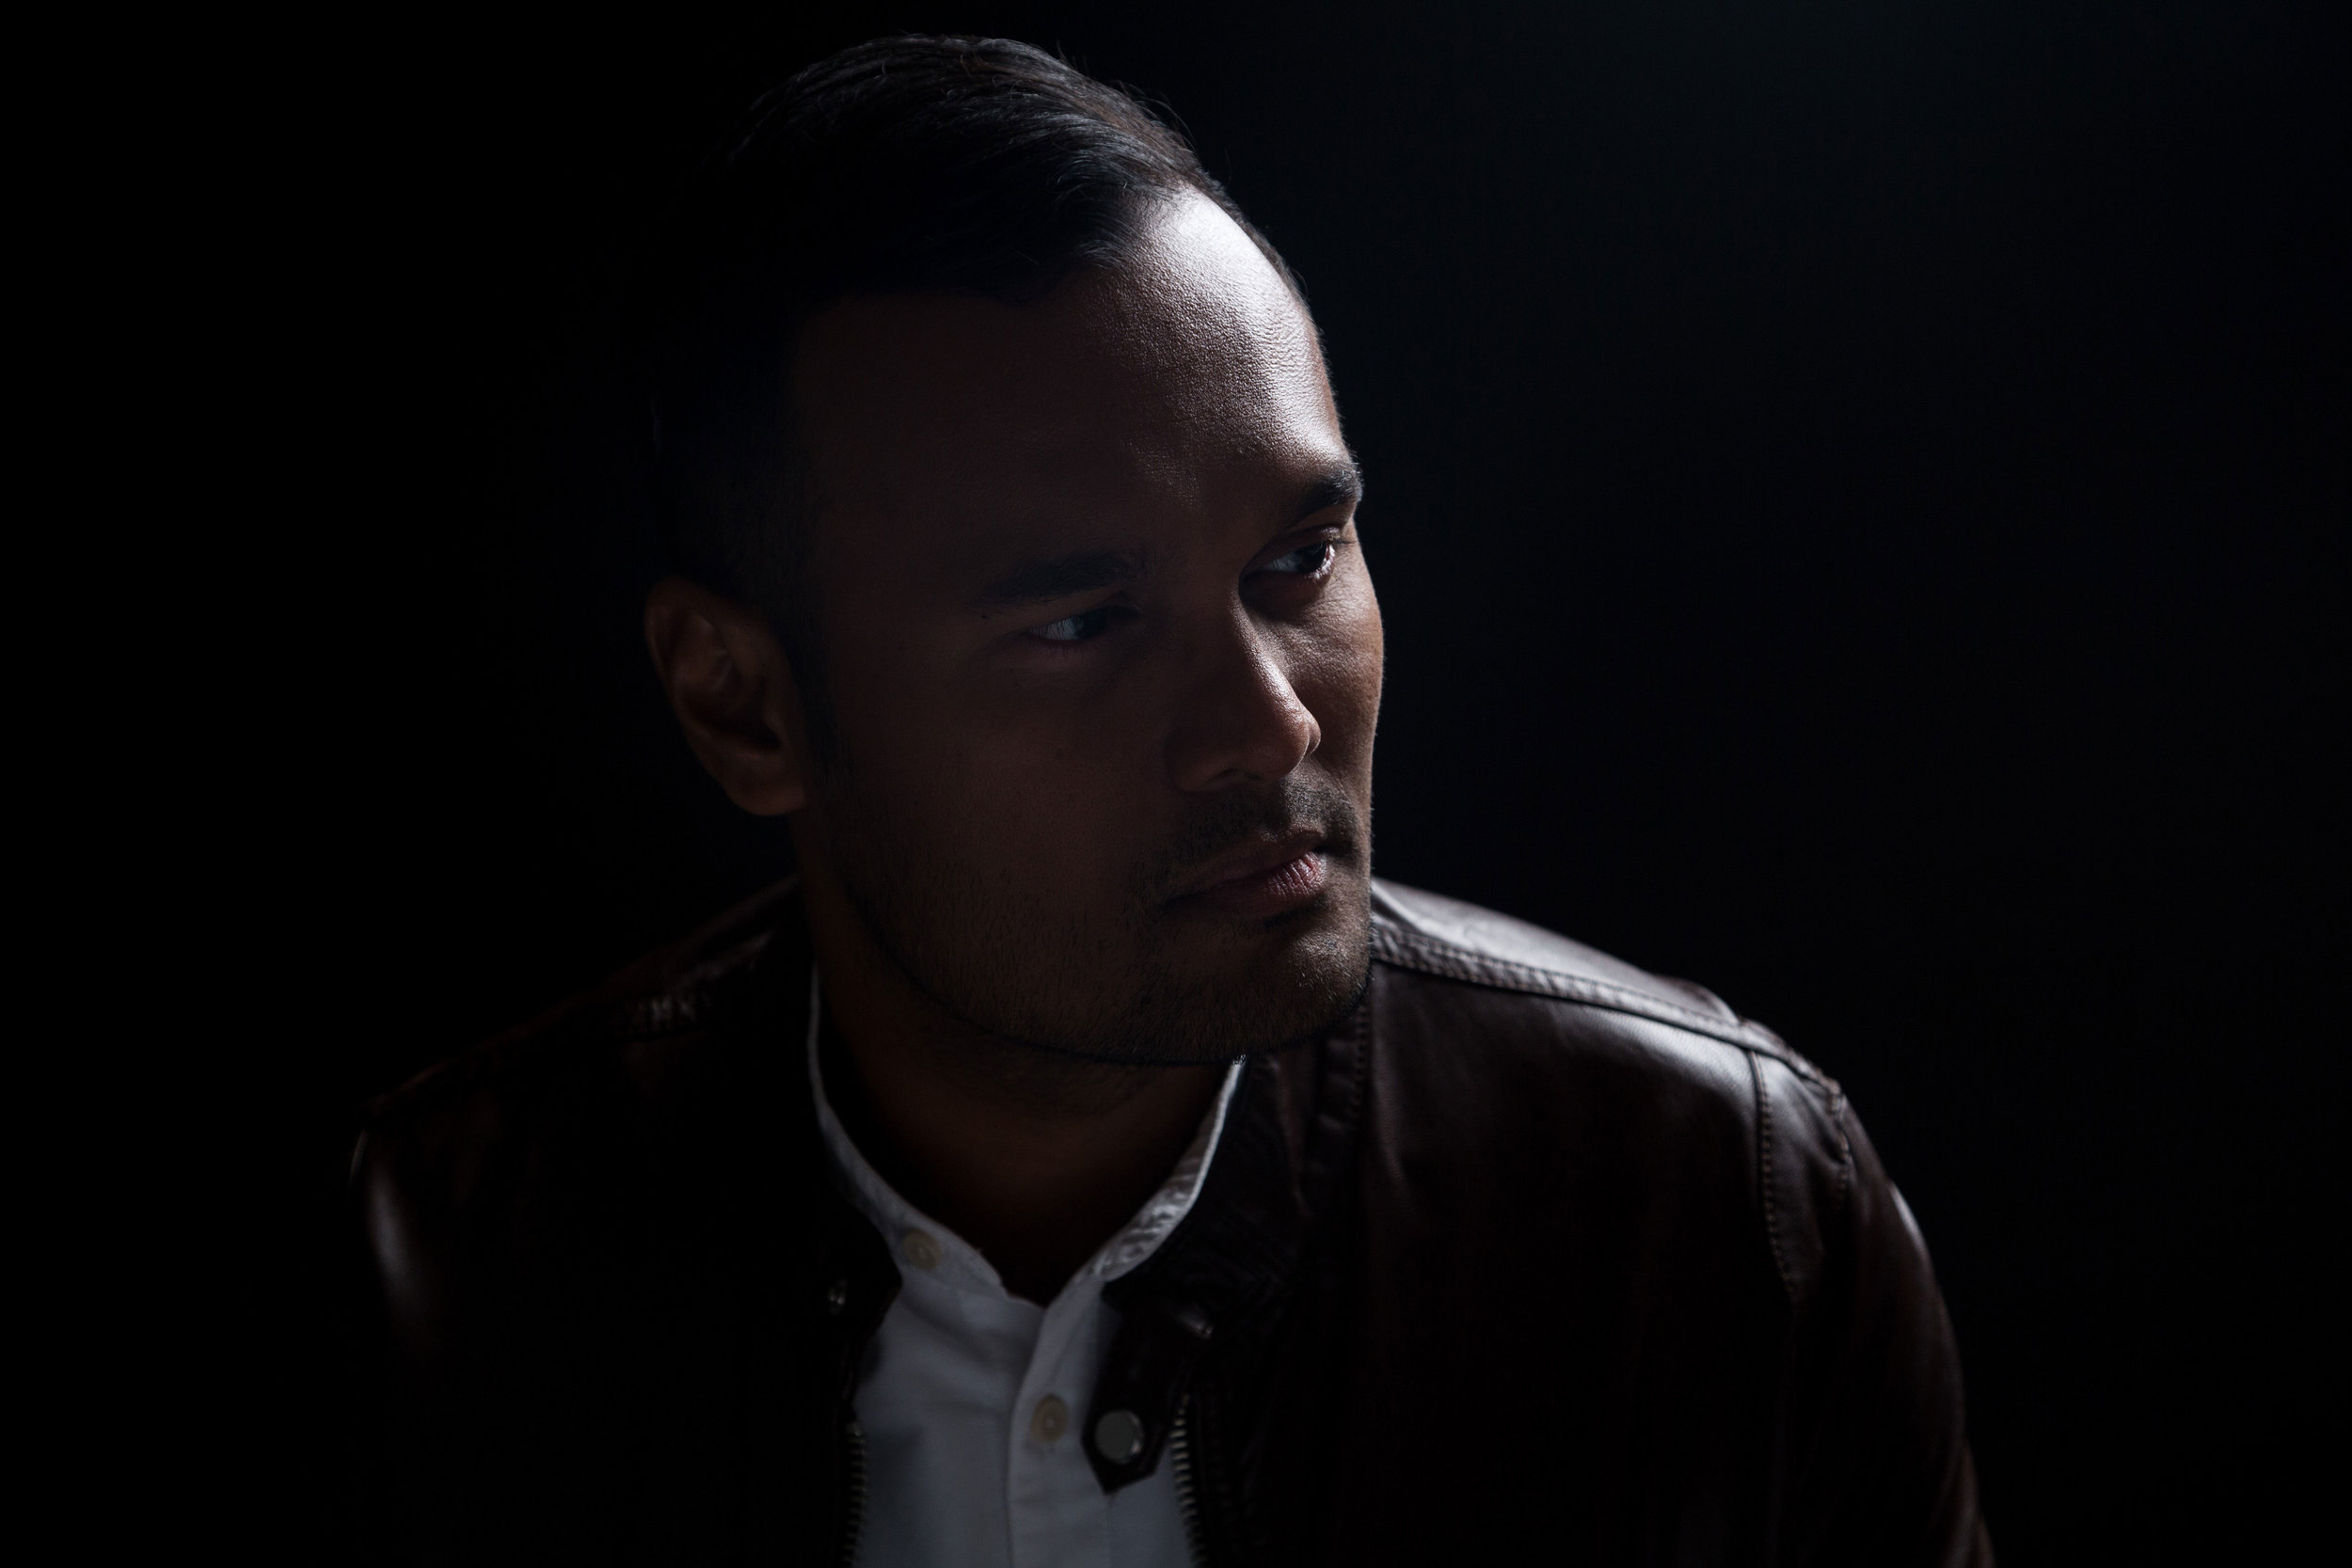 Saiful-2018-LR3.jpg